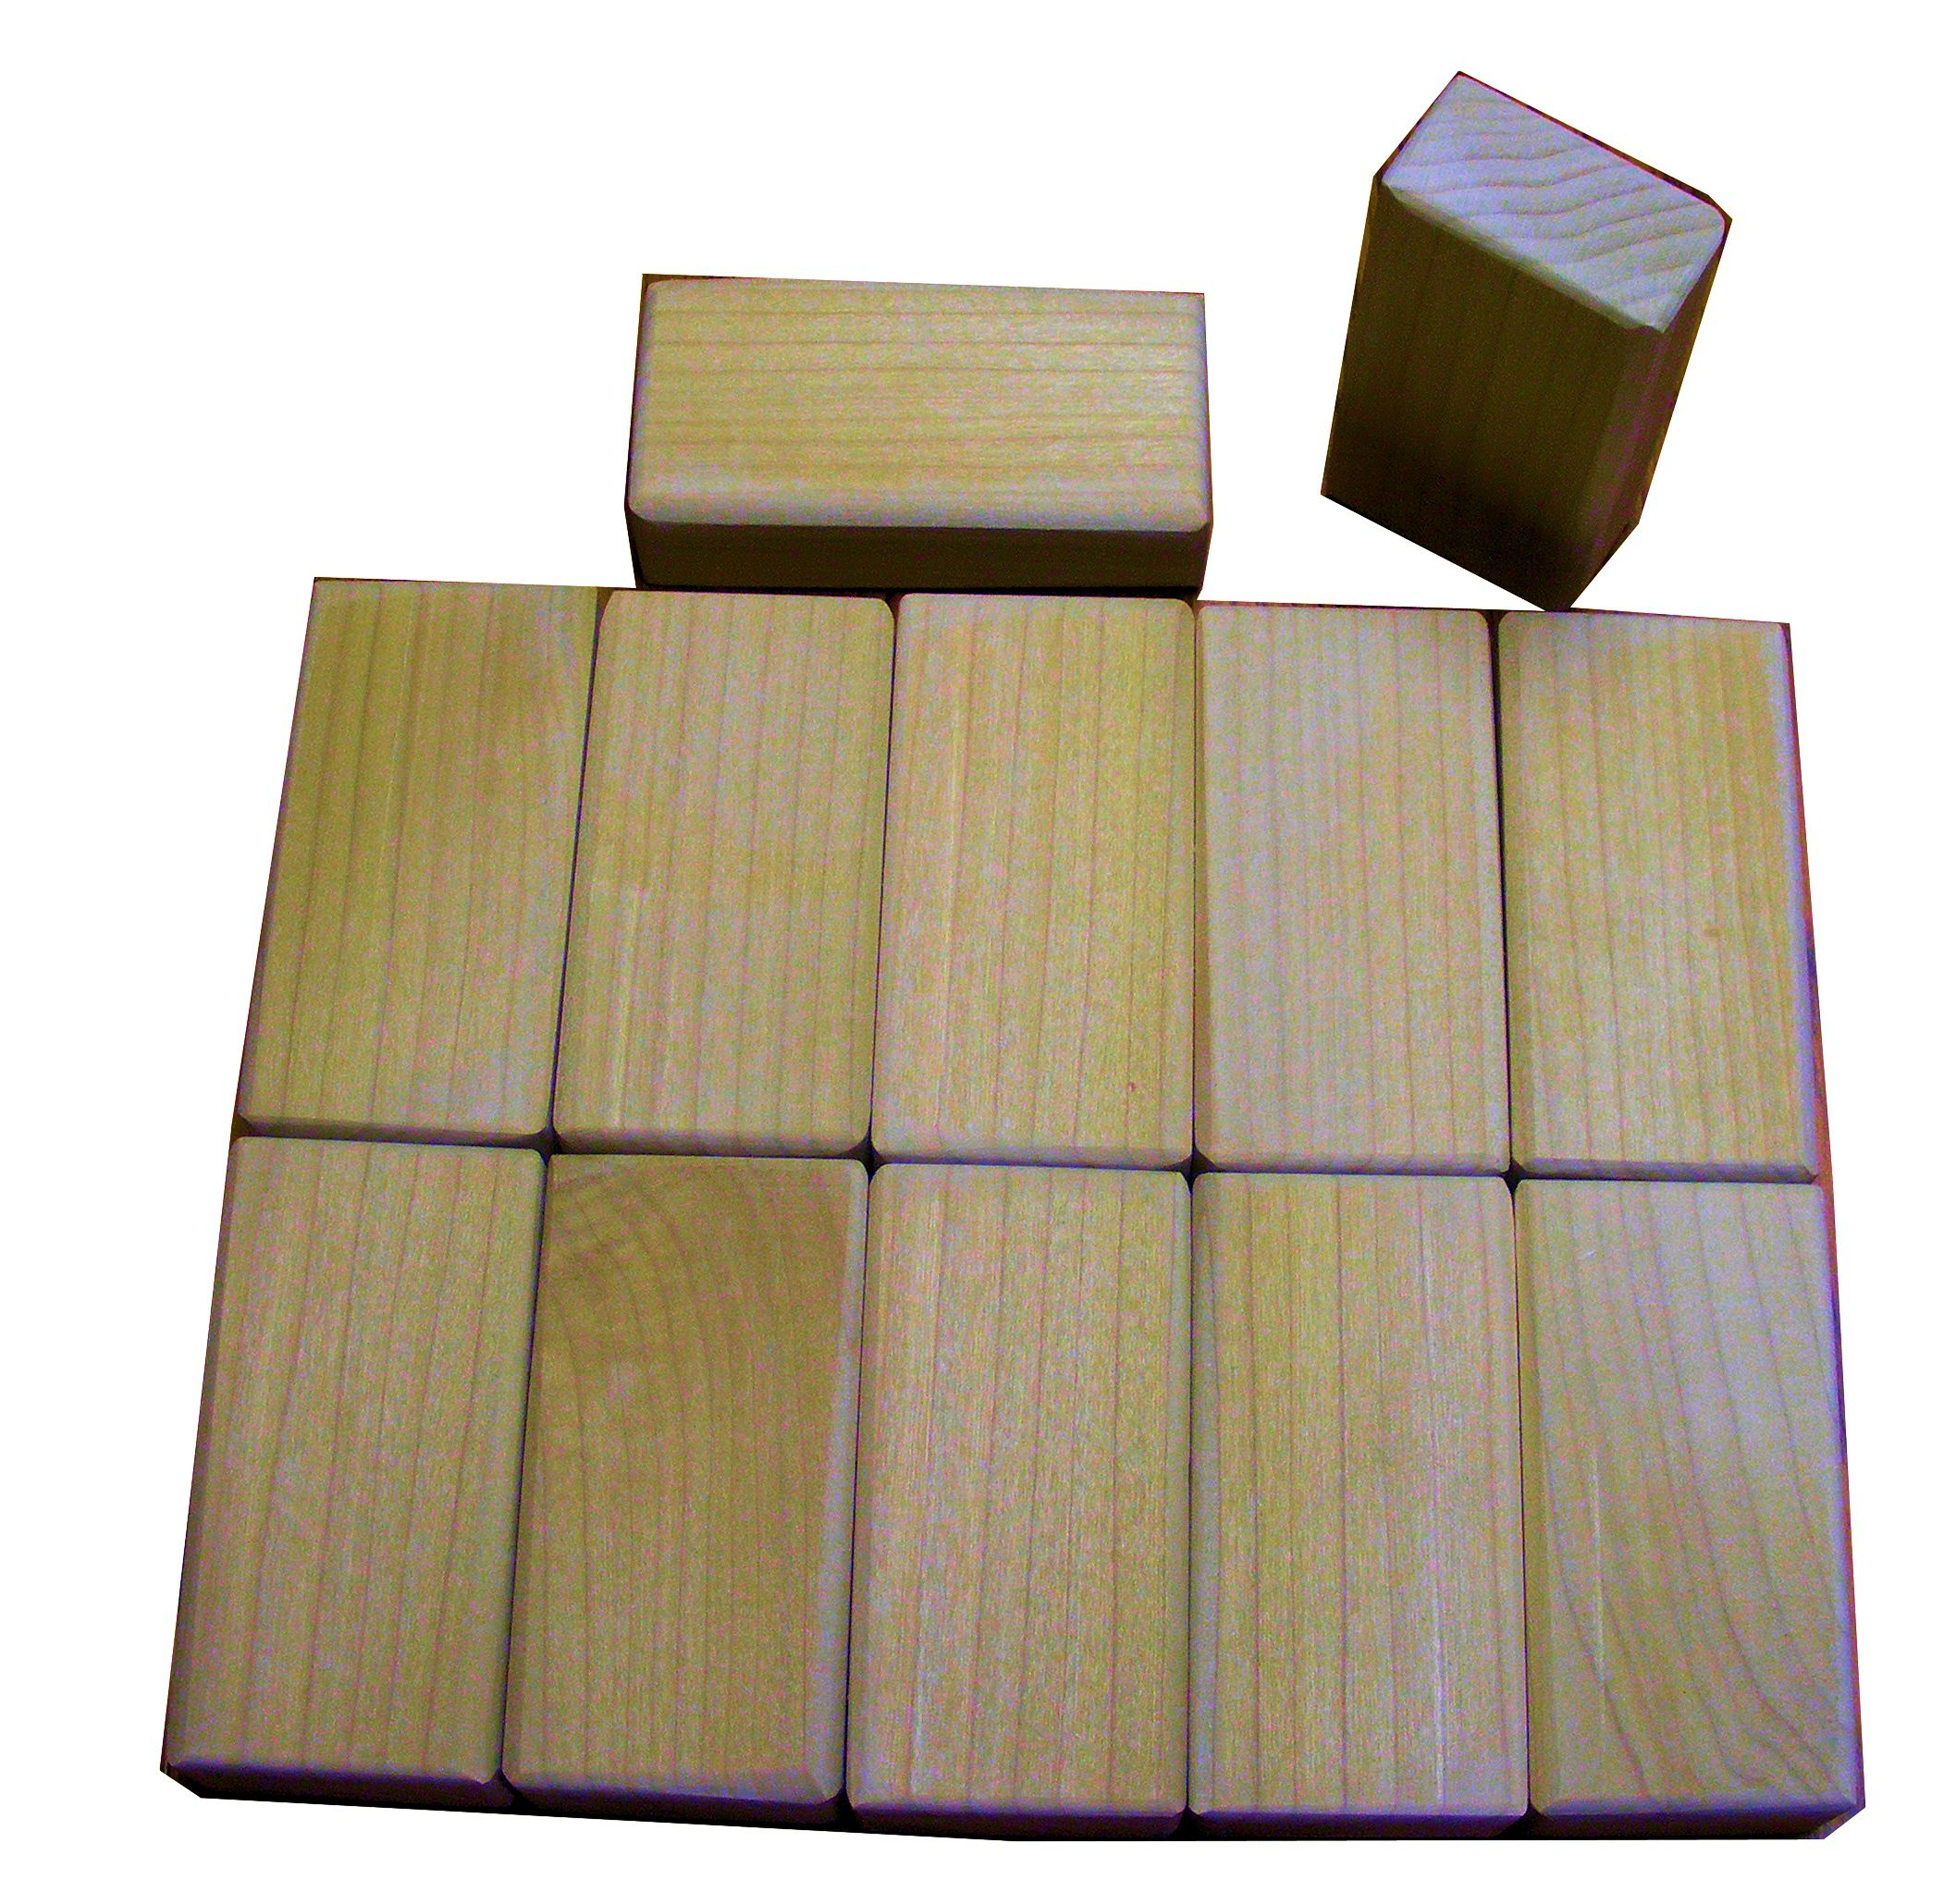 12 Piece Wood Block Set - Math and Motor Skill Development Blocks - Size 4 x 2 x 1 Inches